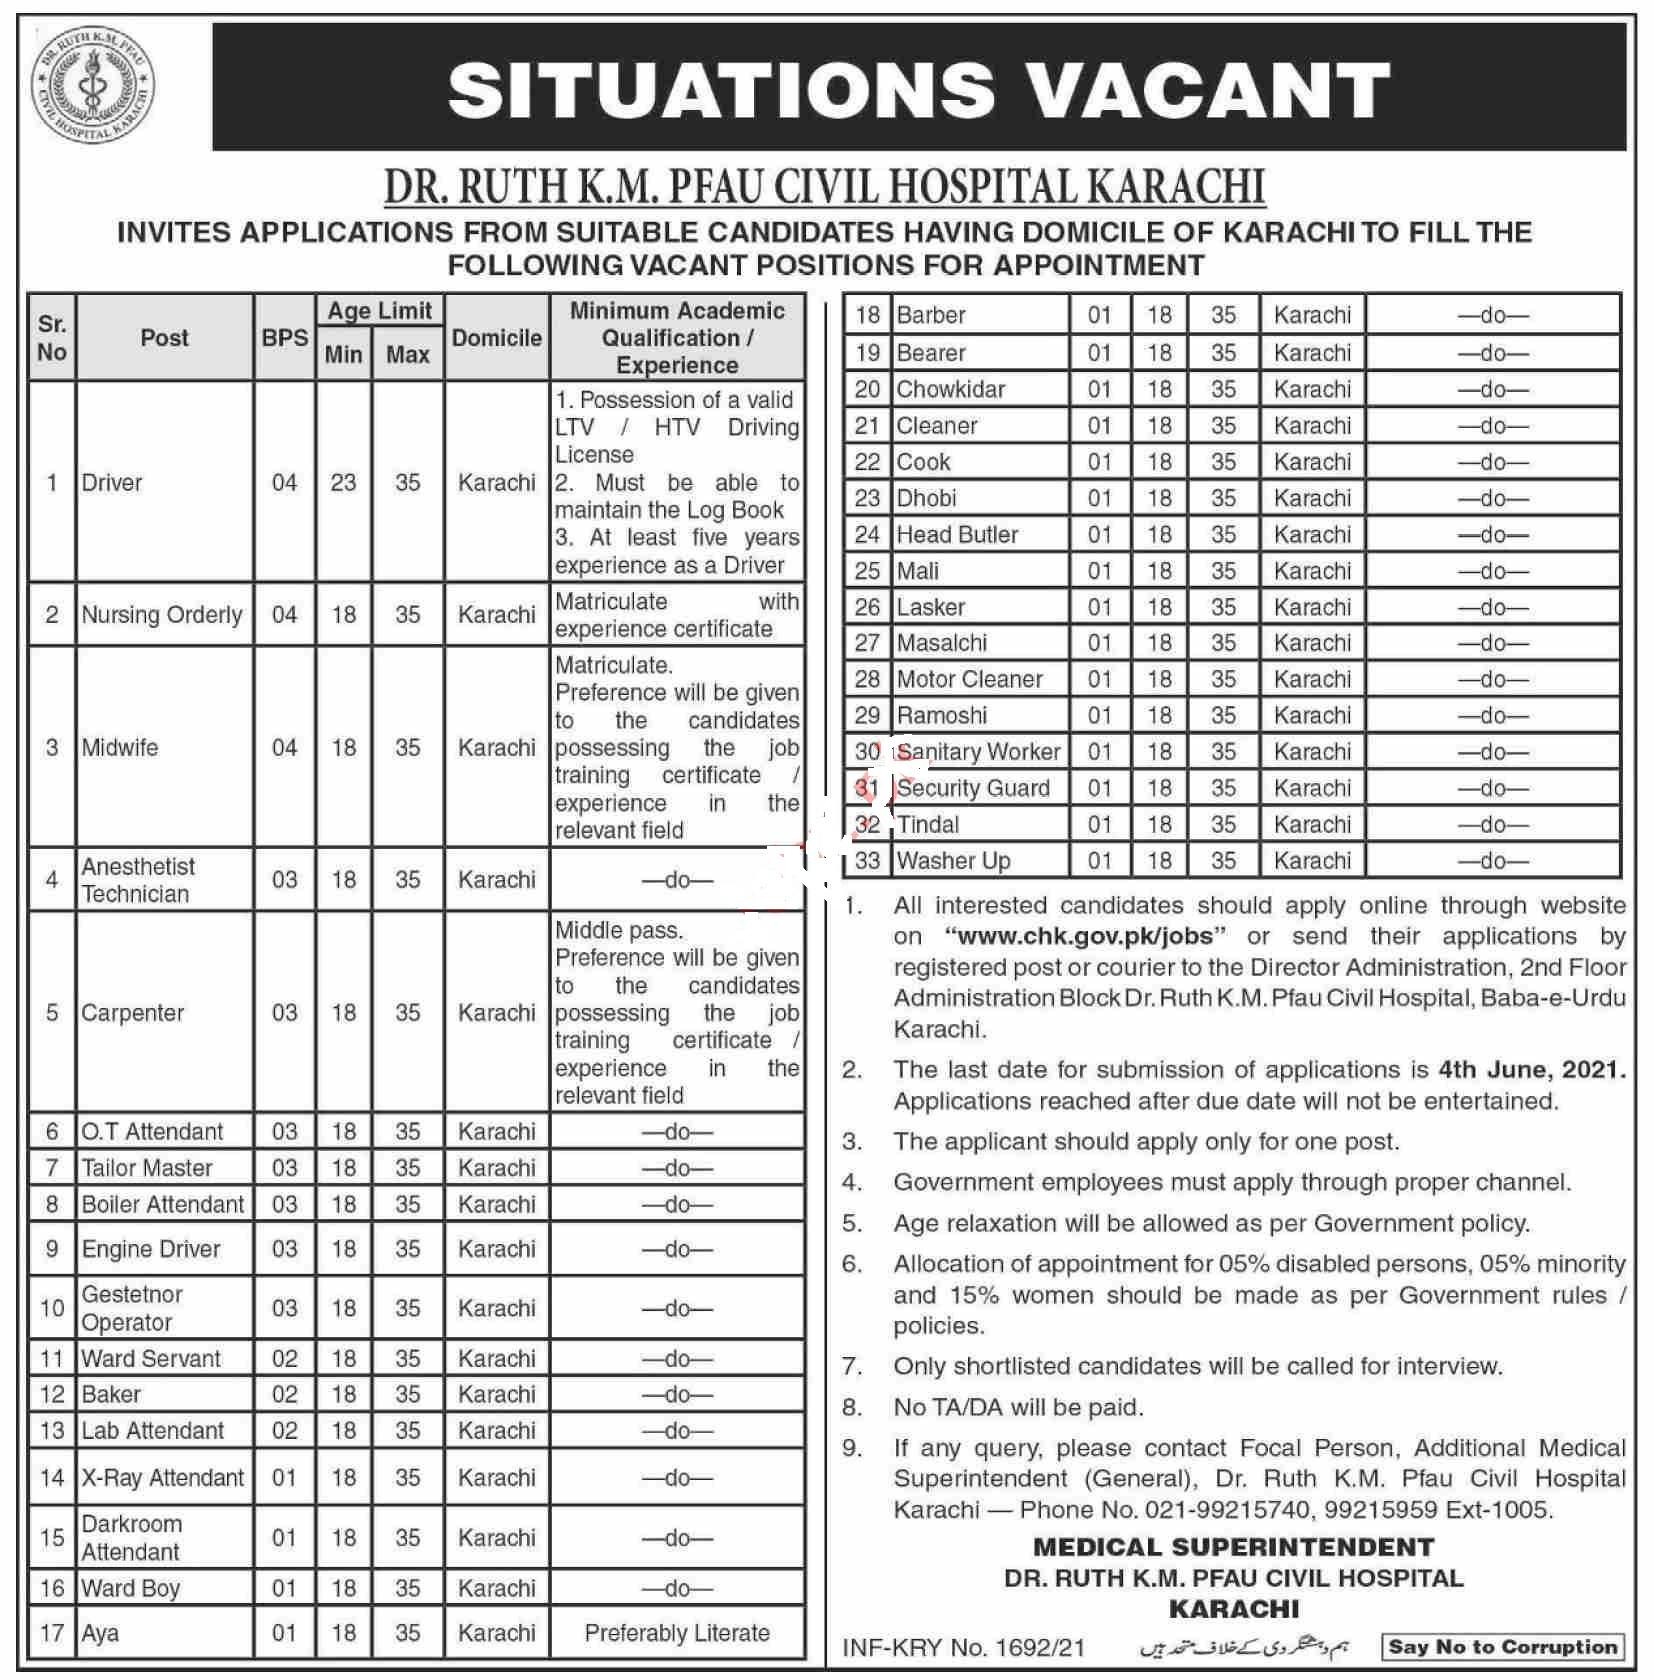 Dr Ruth K M Pfau Civil Hospital Karachi Jobs 2021 for Driver, Nursing Orderly, Midwife, Anesthestist Technician, Carpenter, OT Attendant, Tailor Master and many more